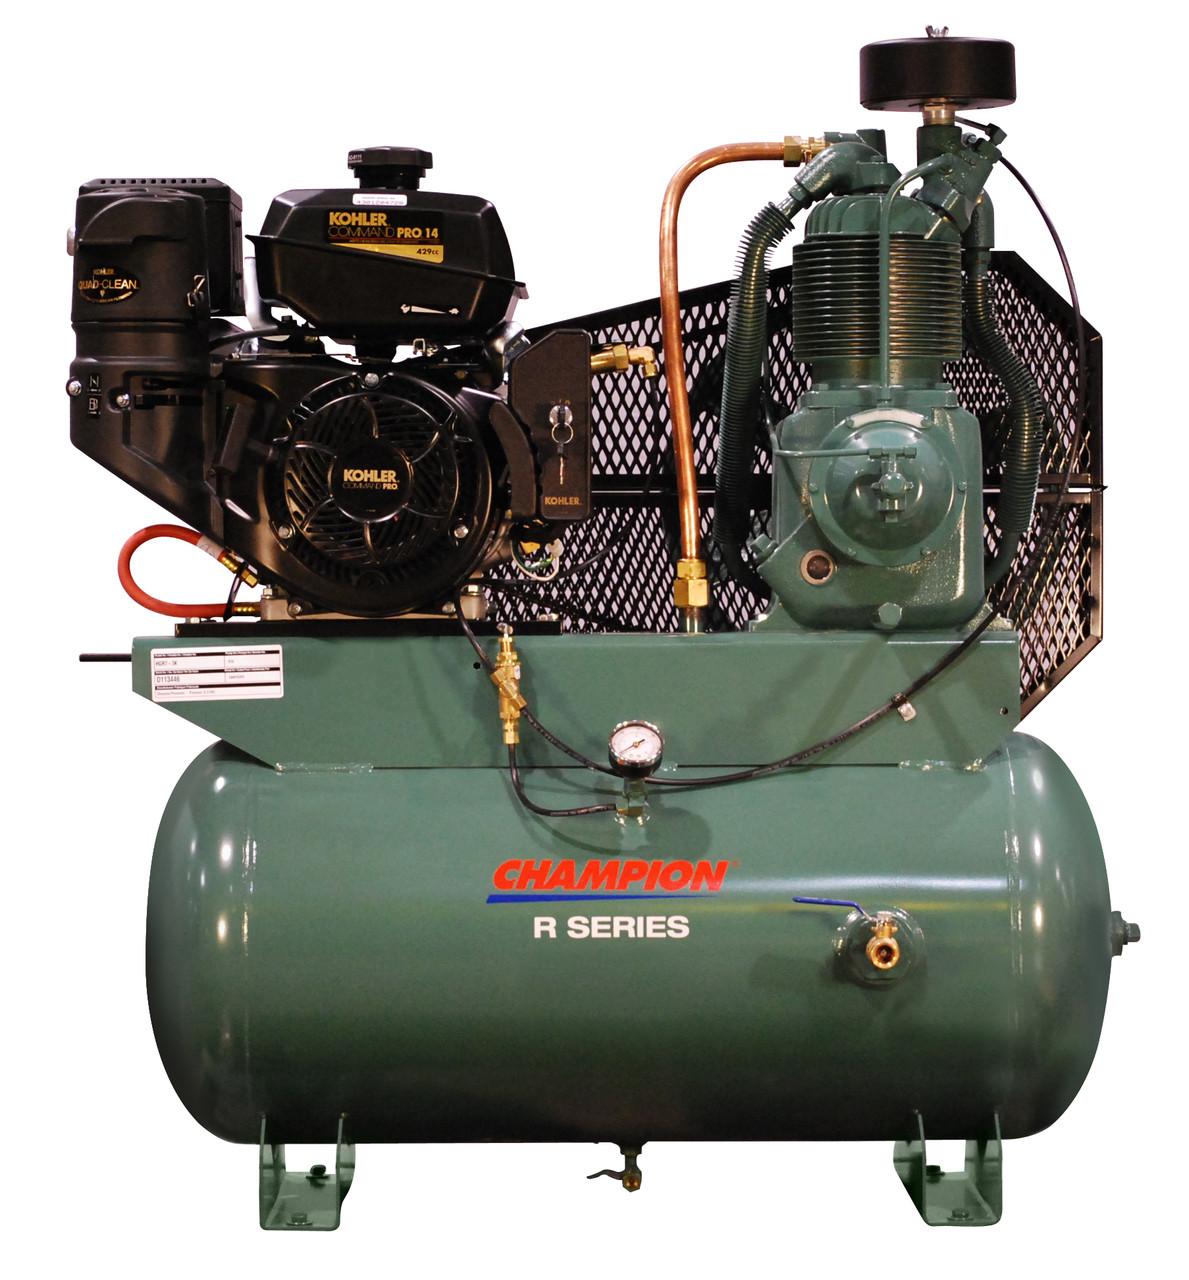 Champion HGR7-3K R-Series Air Compressor